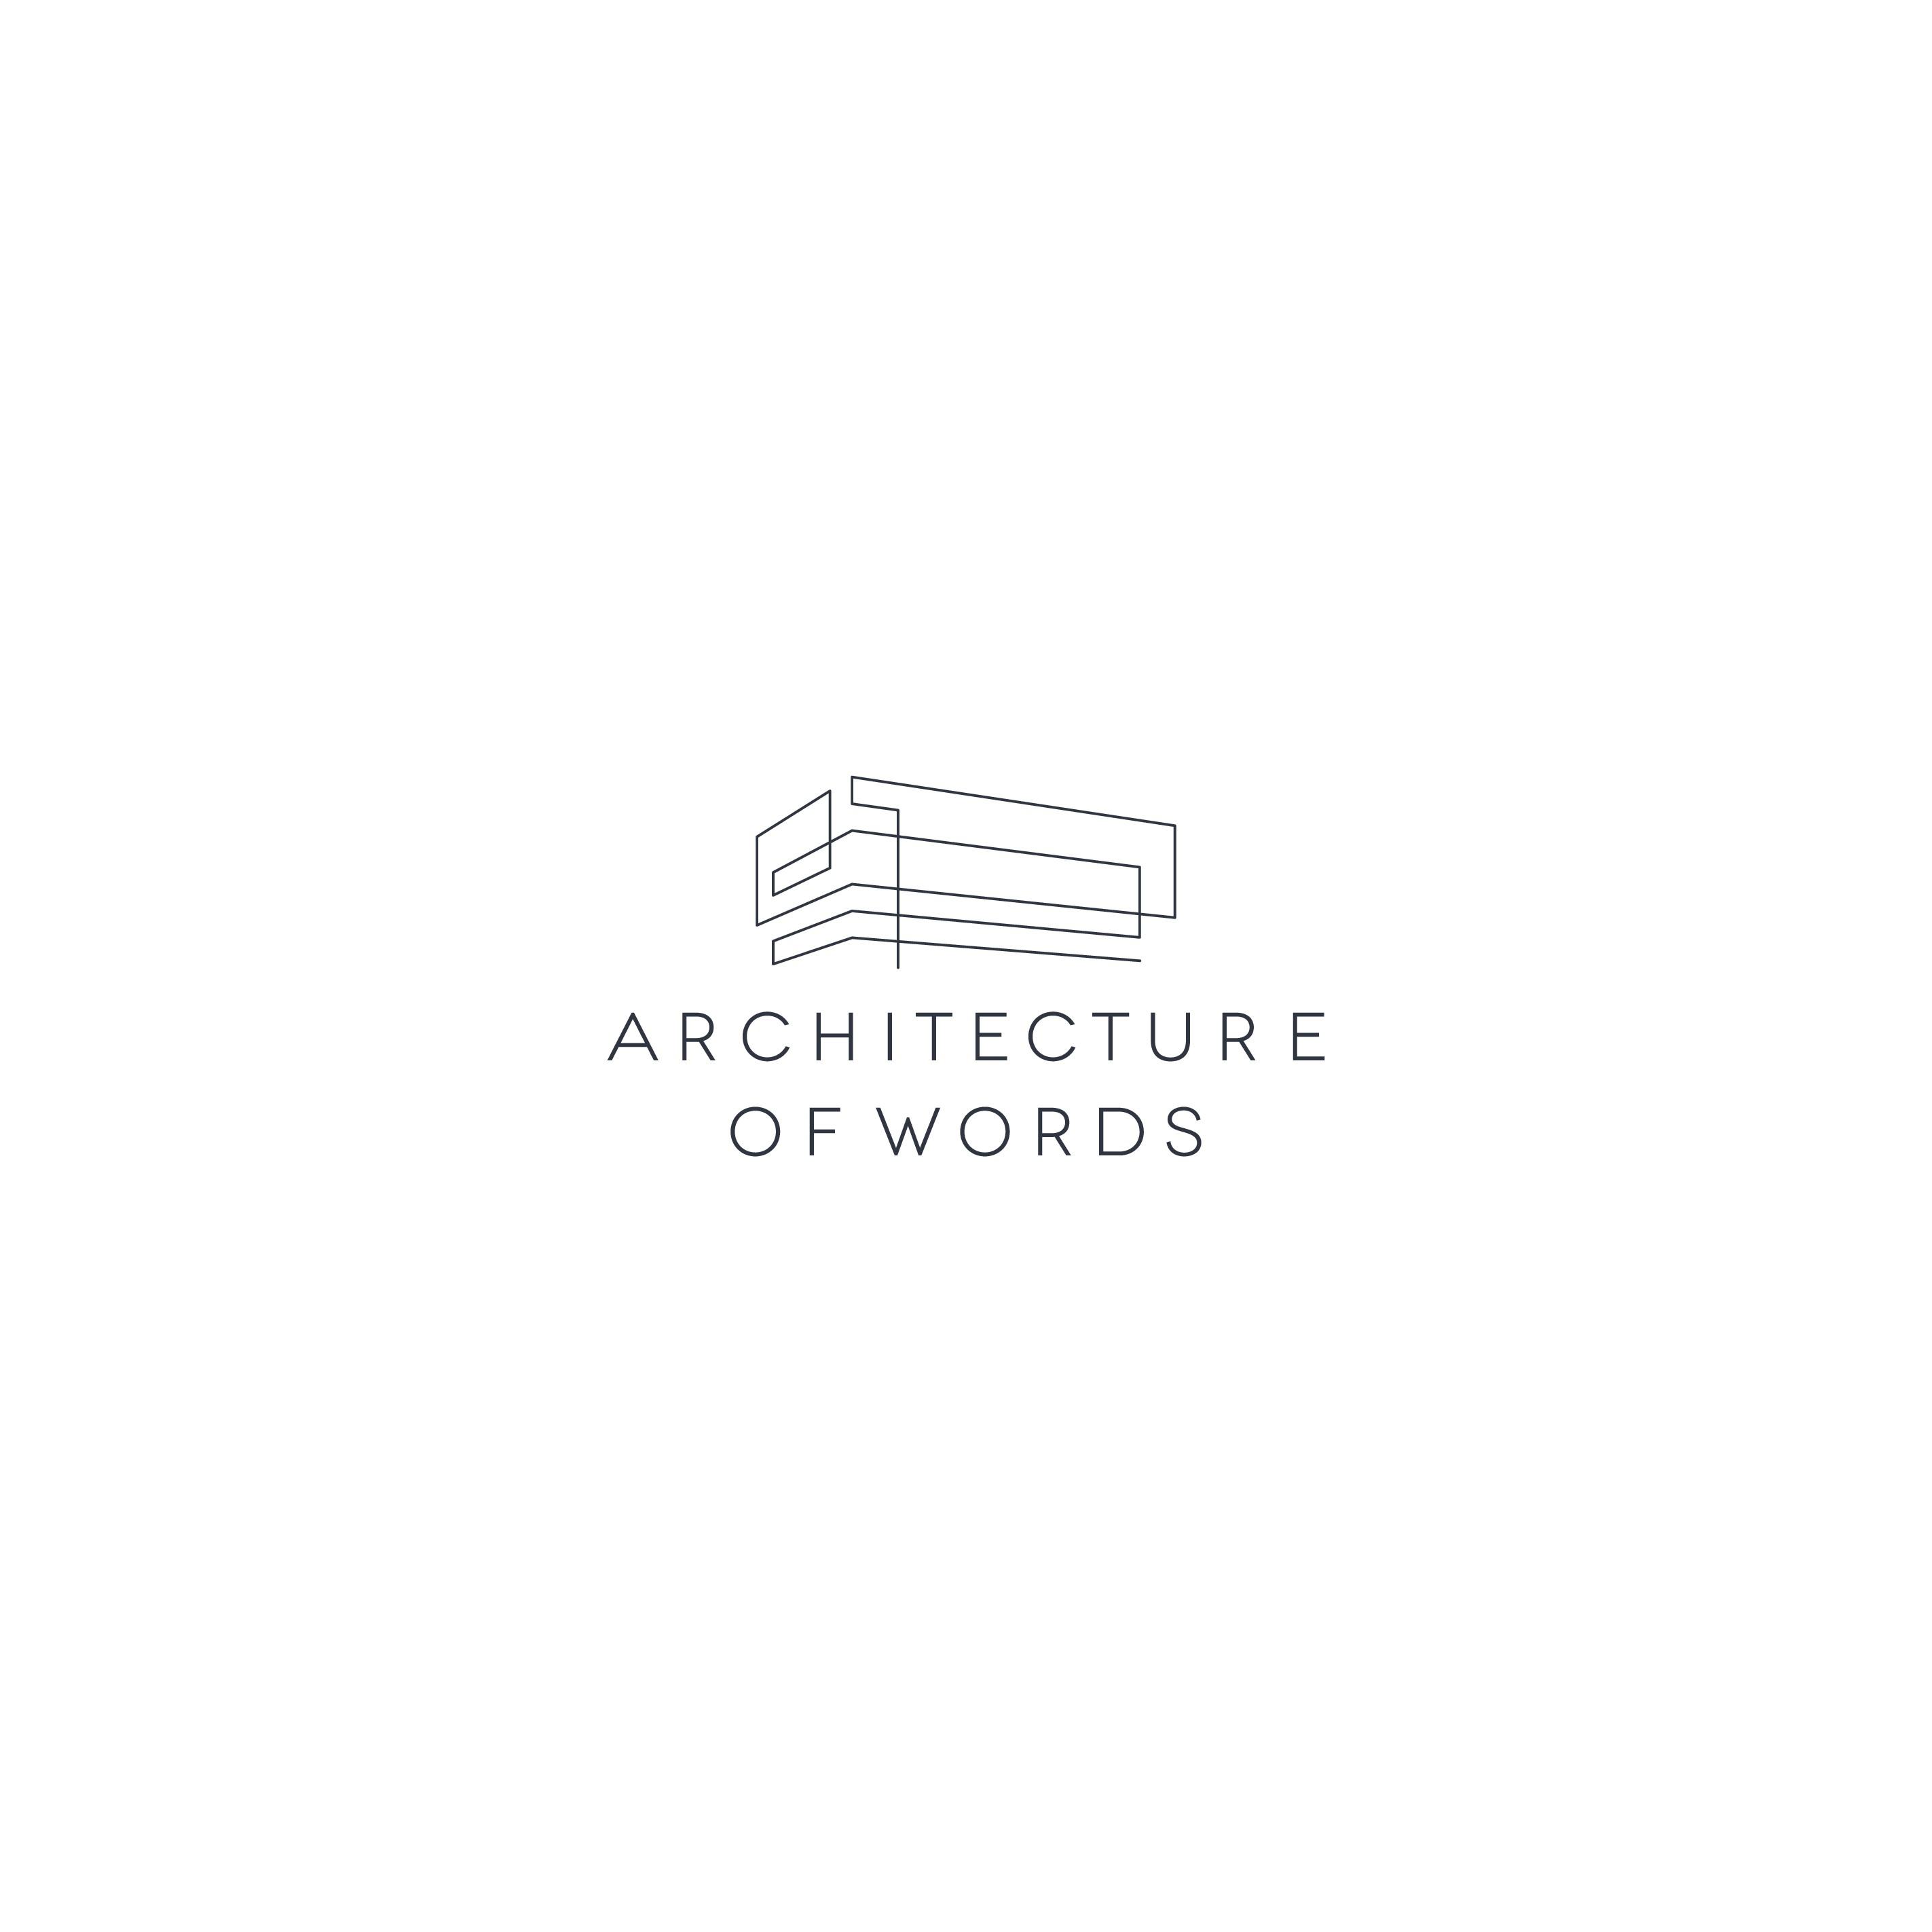 Writer seeks minimal logo with a nod to Agnes Martin and Frank Lloyd Wright